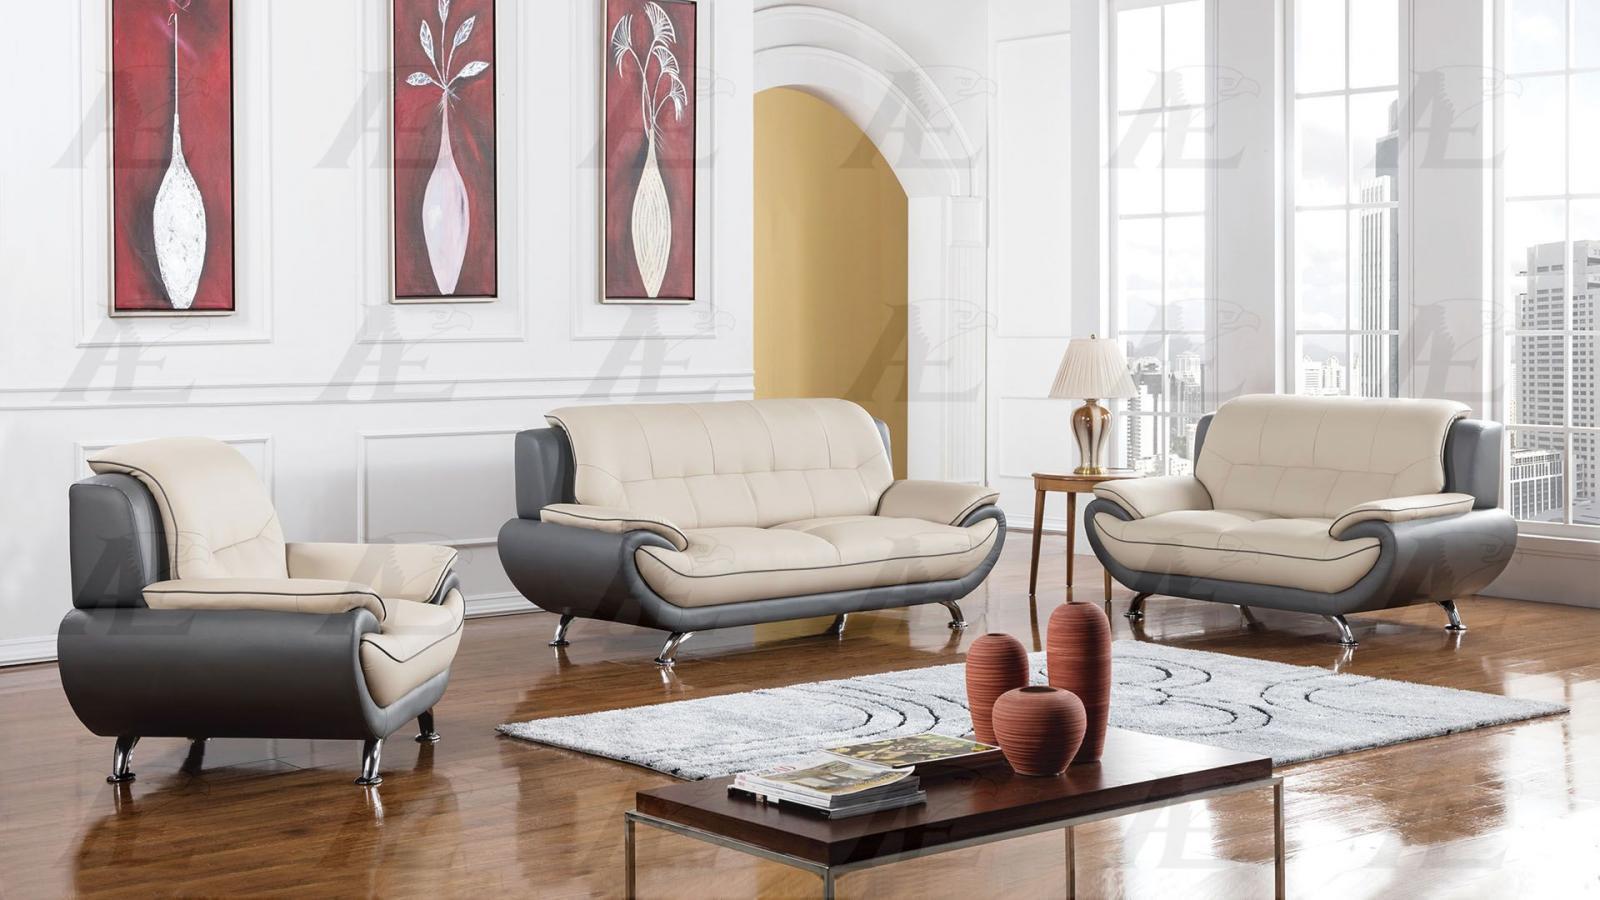 DG Light/Dark Gray Sofa Loveseat Chair F/ Leather 3Pcs